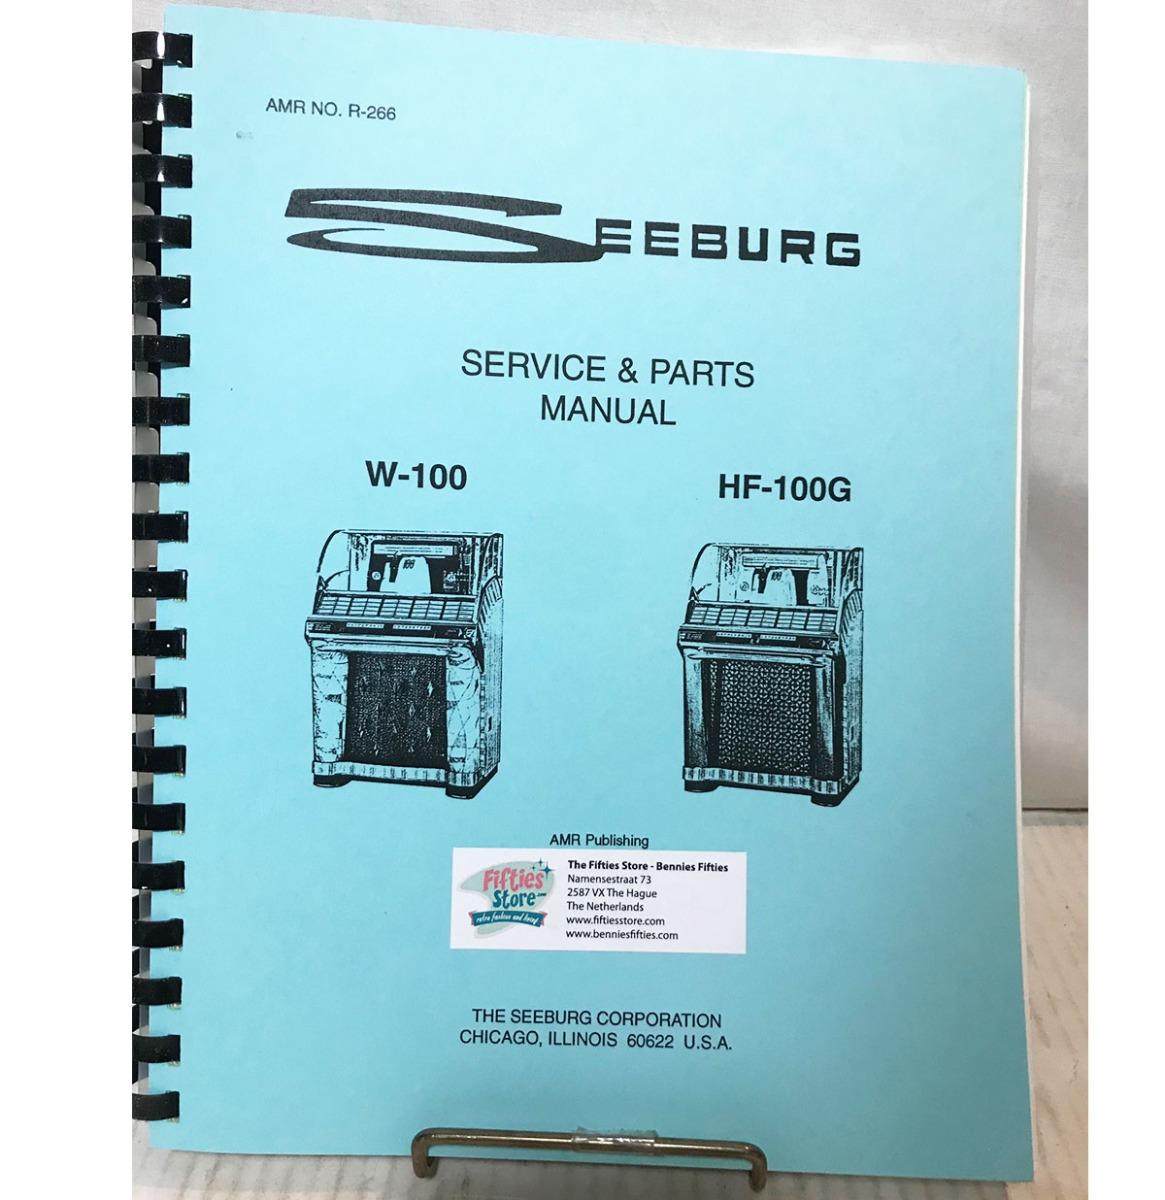 Service Manual - Seeburg Jukebox Model W-100 & HF-100G